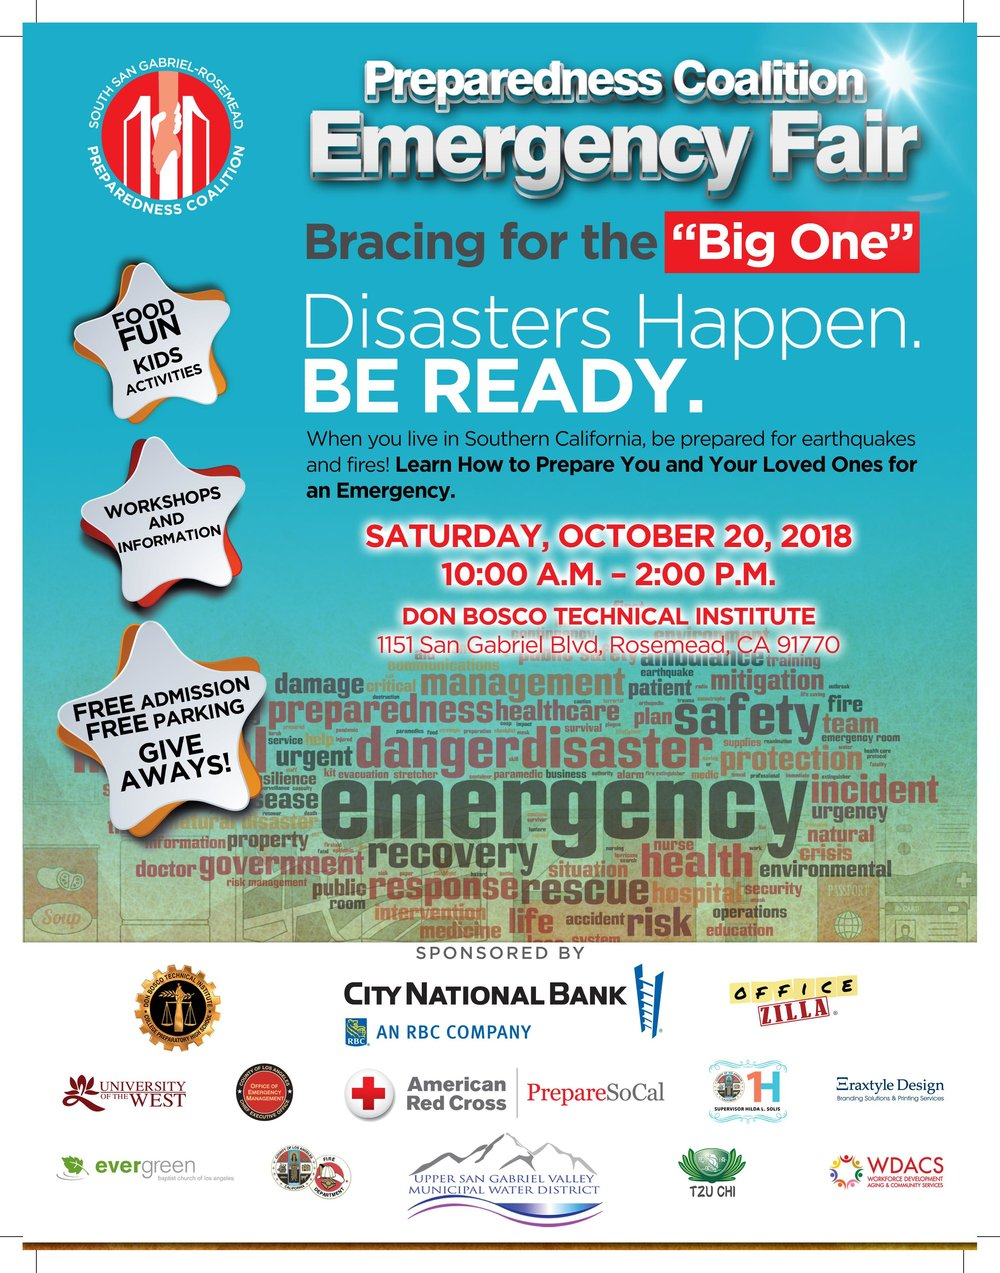 PREPAREDNESS coalition emergency fair - October 20th, 2018